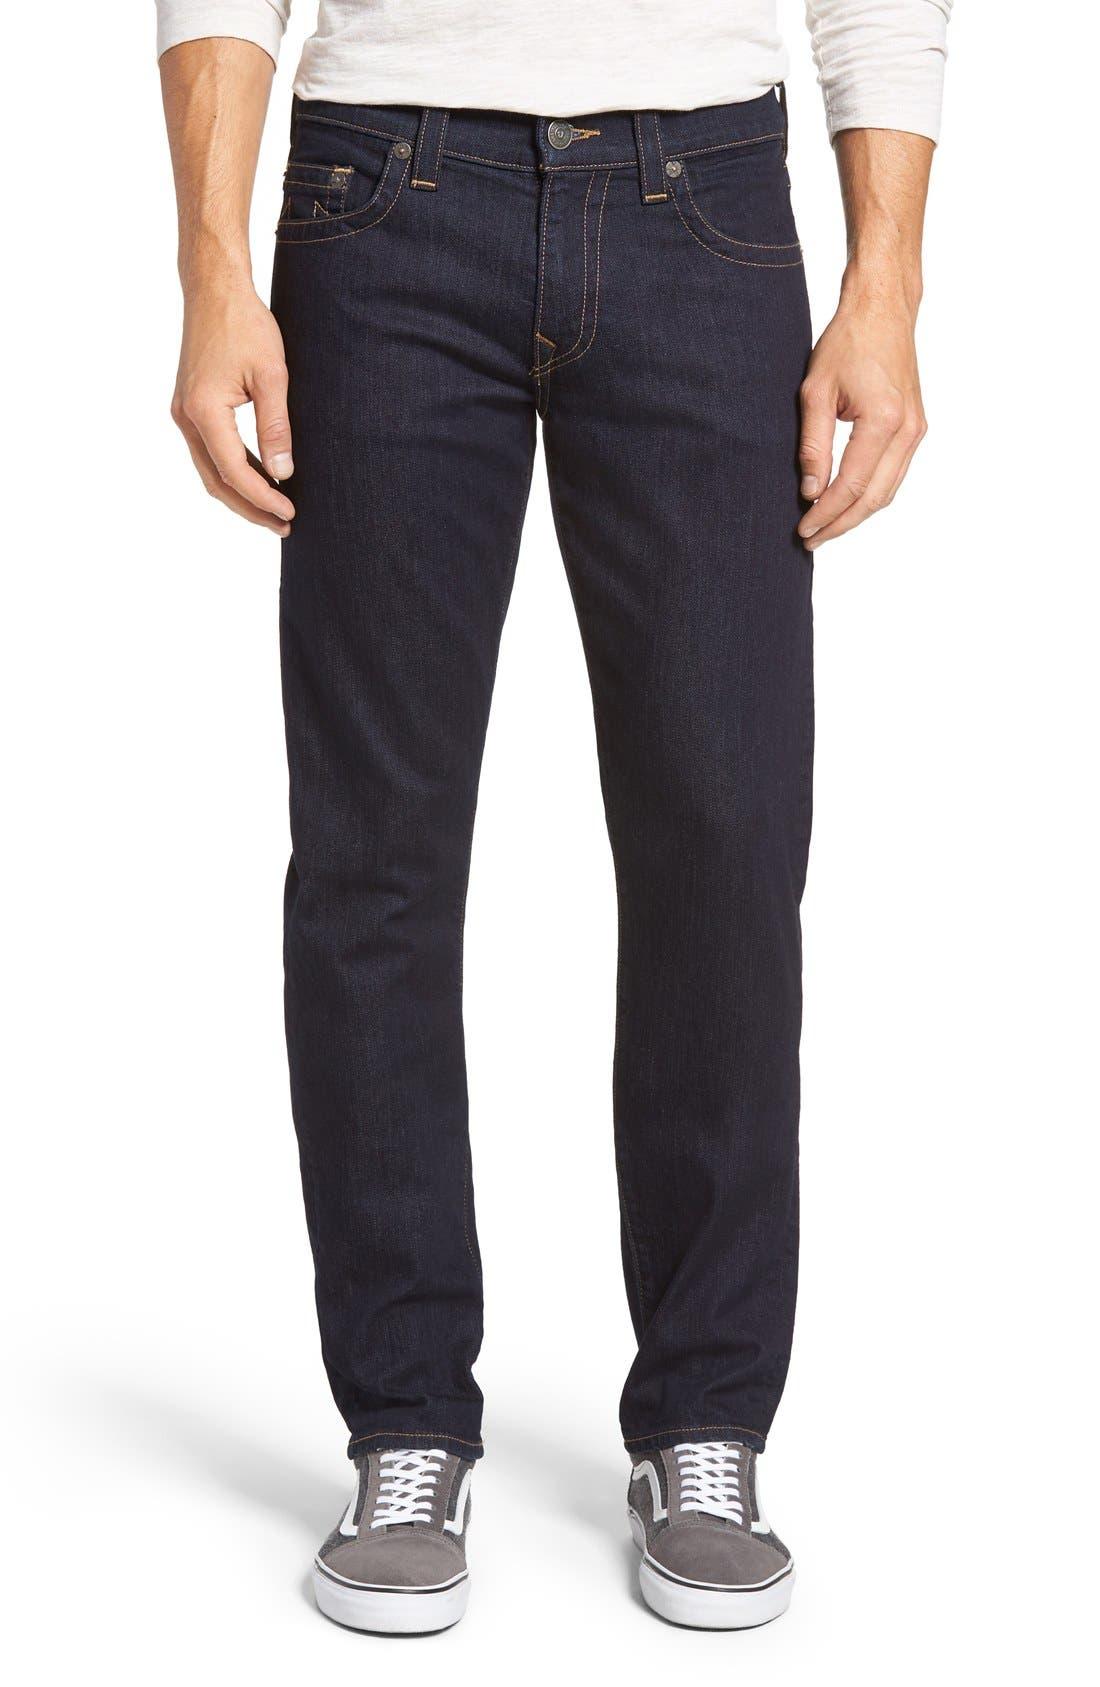 Geno Straight Leg Jeans,                         Main,                         color, 403